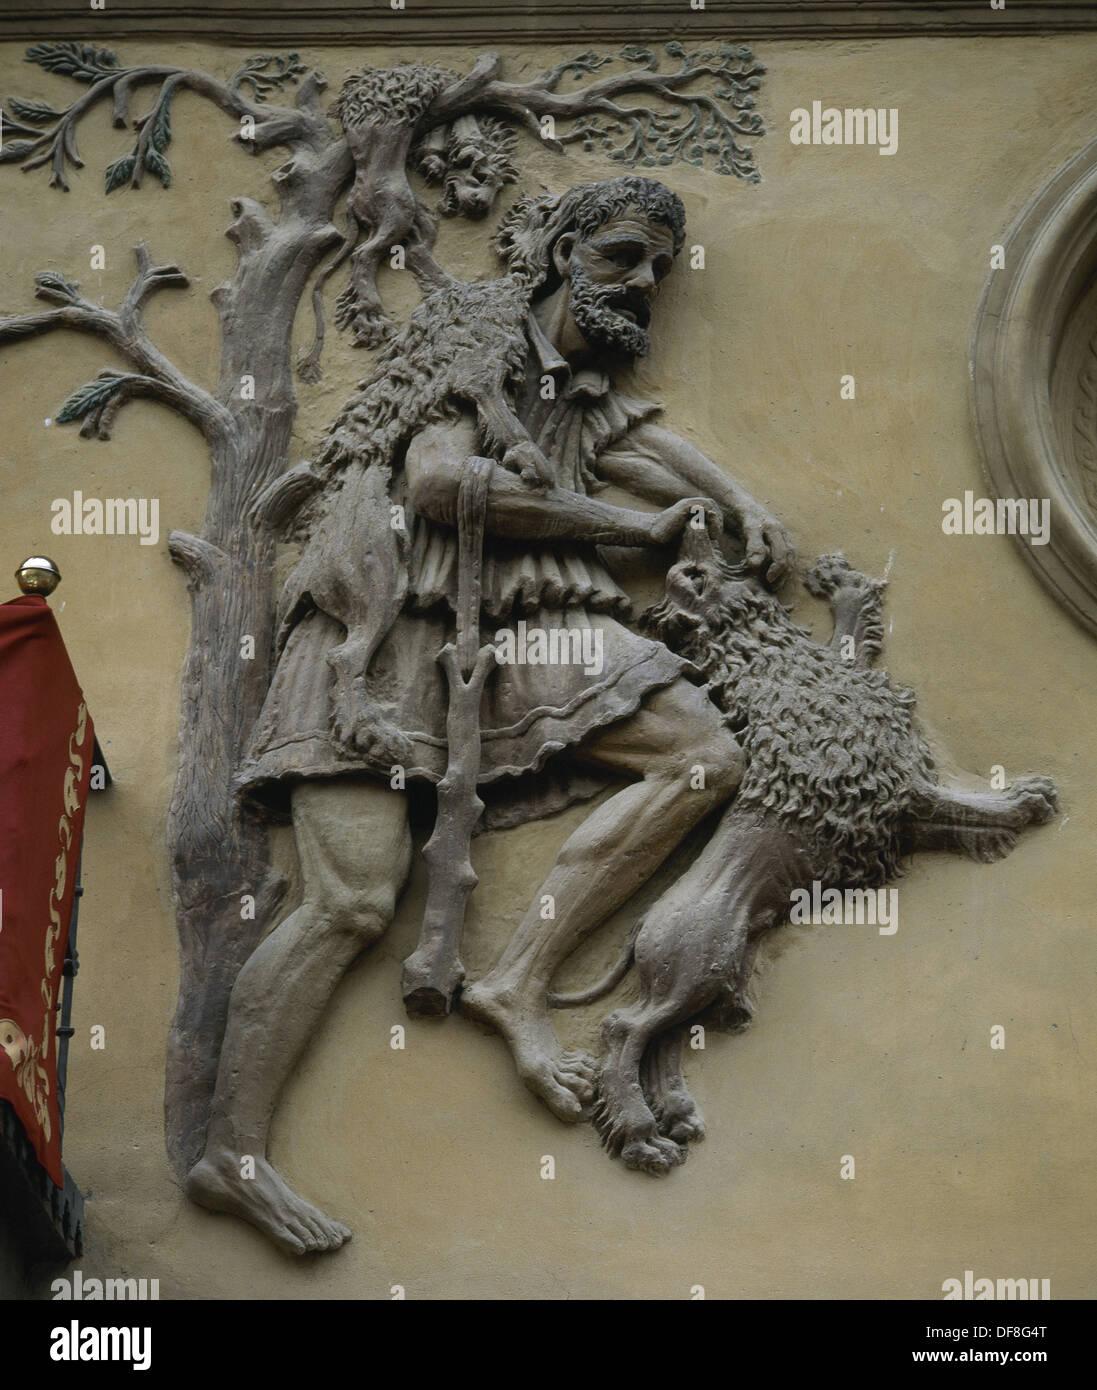 Twelve Labors Of Hercules First Labor Kill The Nemean